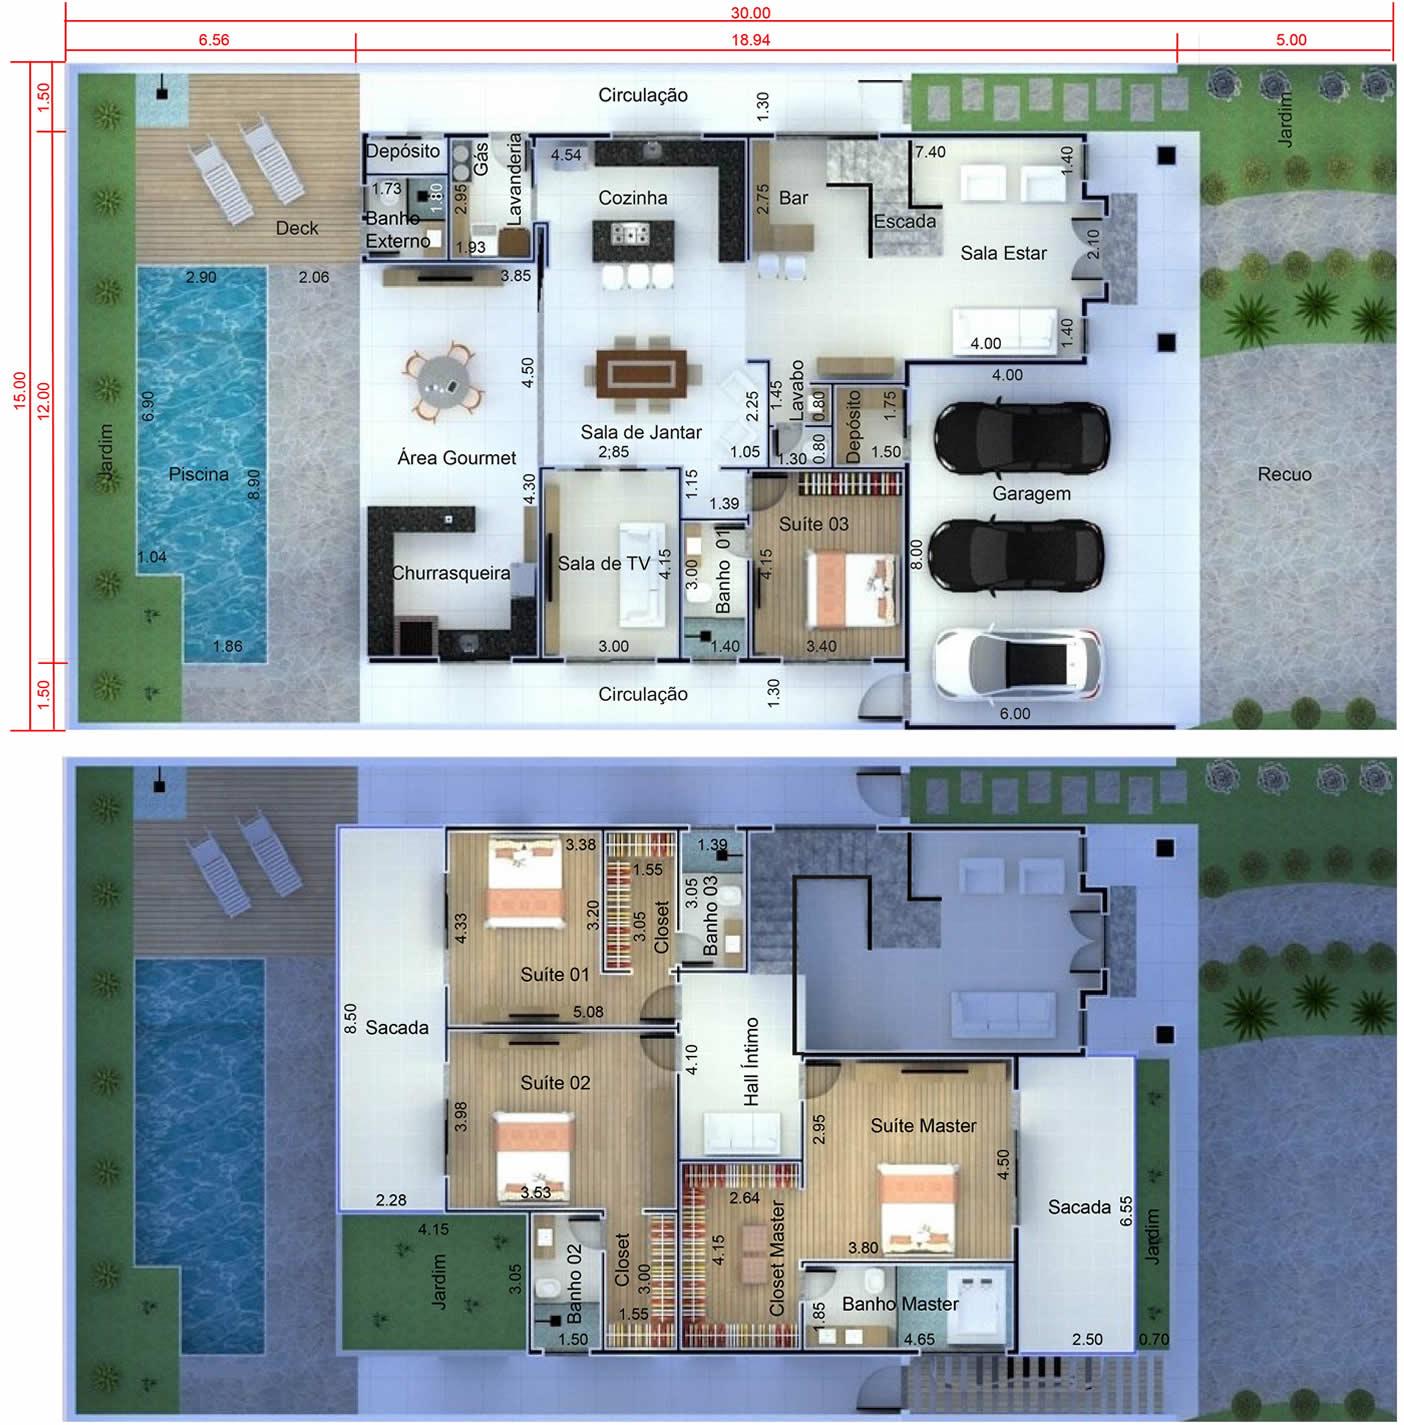 Planta de casa neoclássica moderna. Planta para terreno 15x30